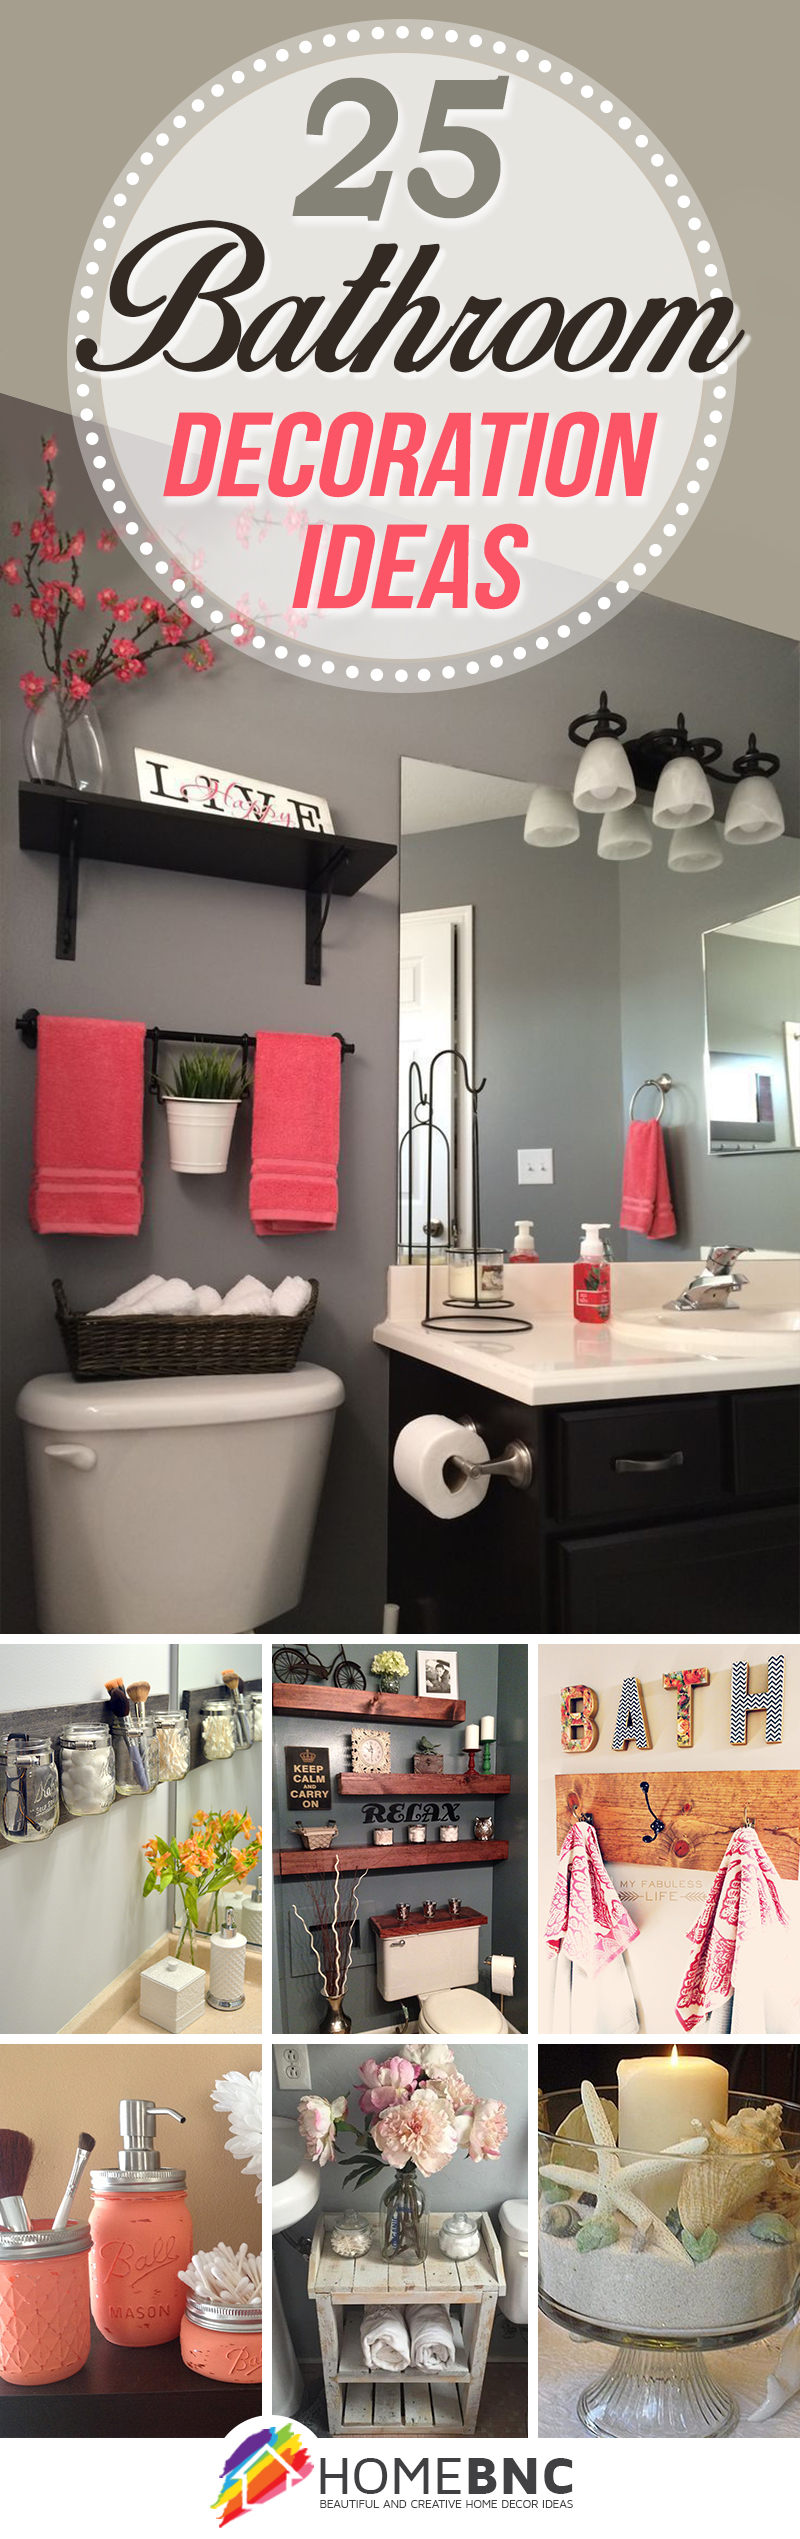 25 Best Bathroom Decor Ideas and Designs for 2017 on Popular Bathroom Ideas  id=16525